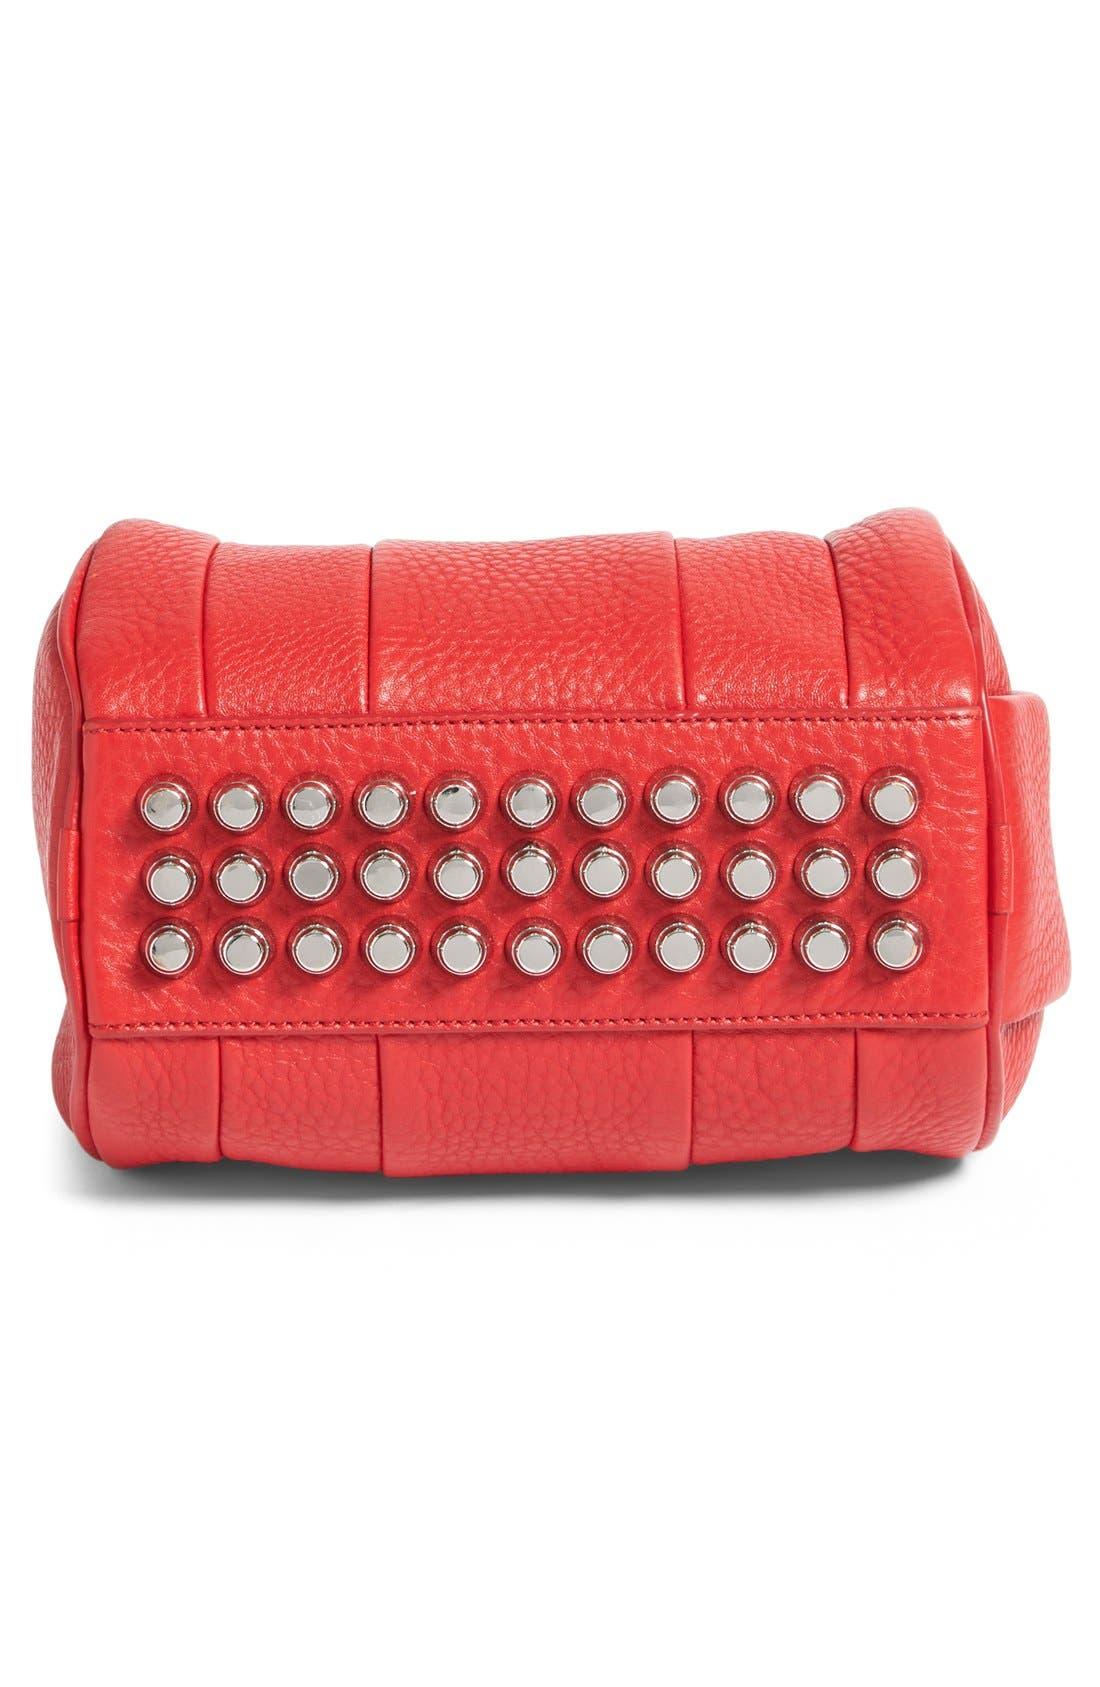 'Mini Rockie - Nickel' Leather Crossbody Satchel,                             Alternate thumbnail 6, color,